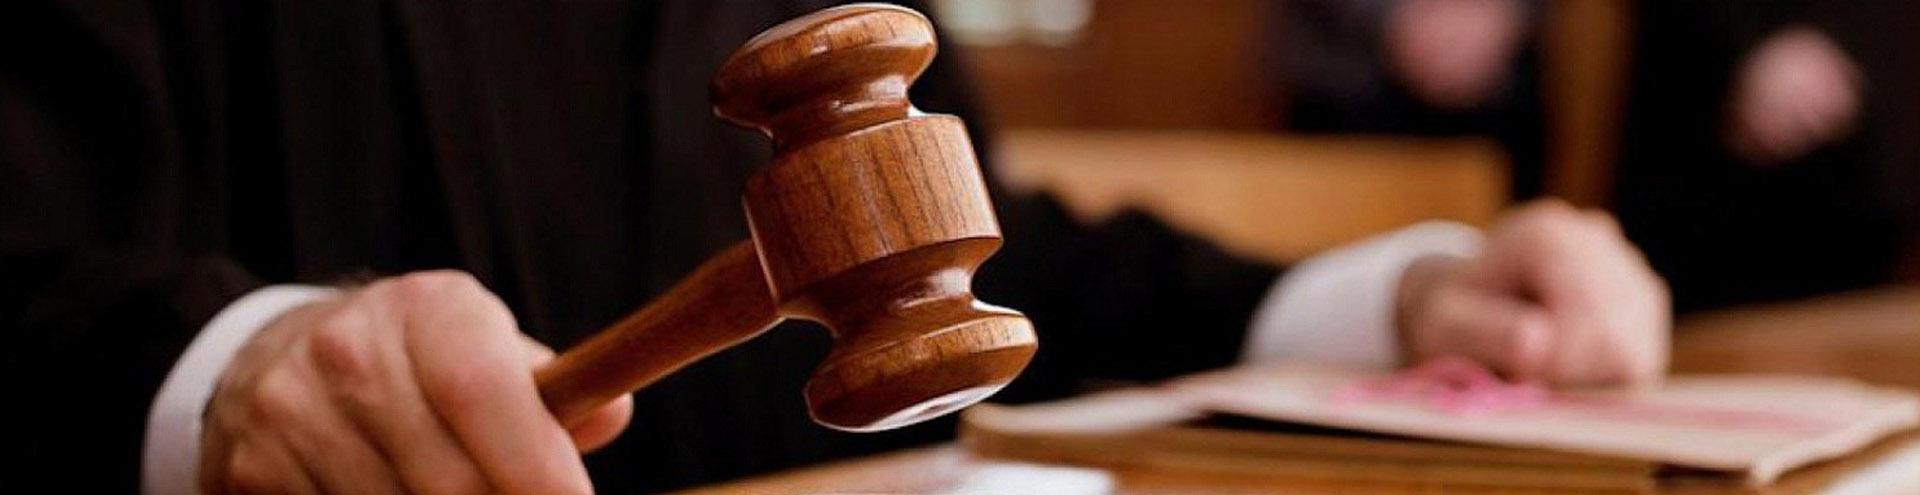 арбитражные споры в Самаре